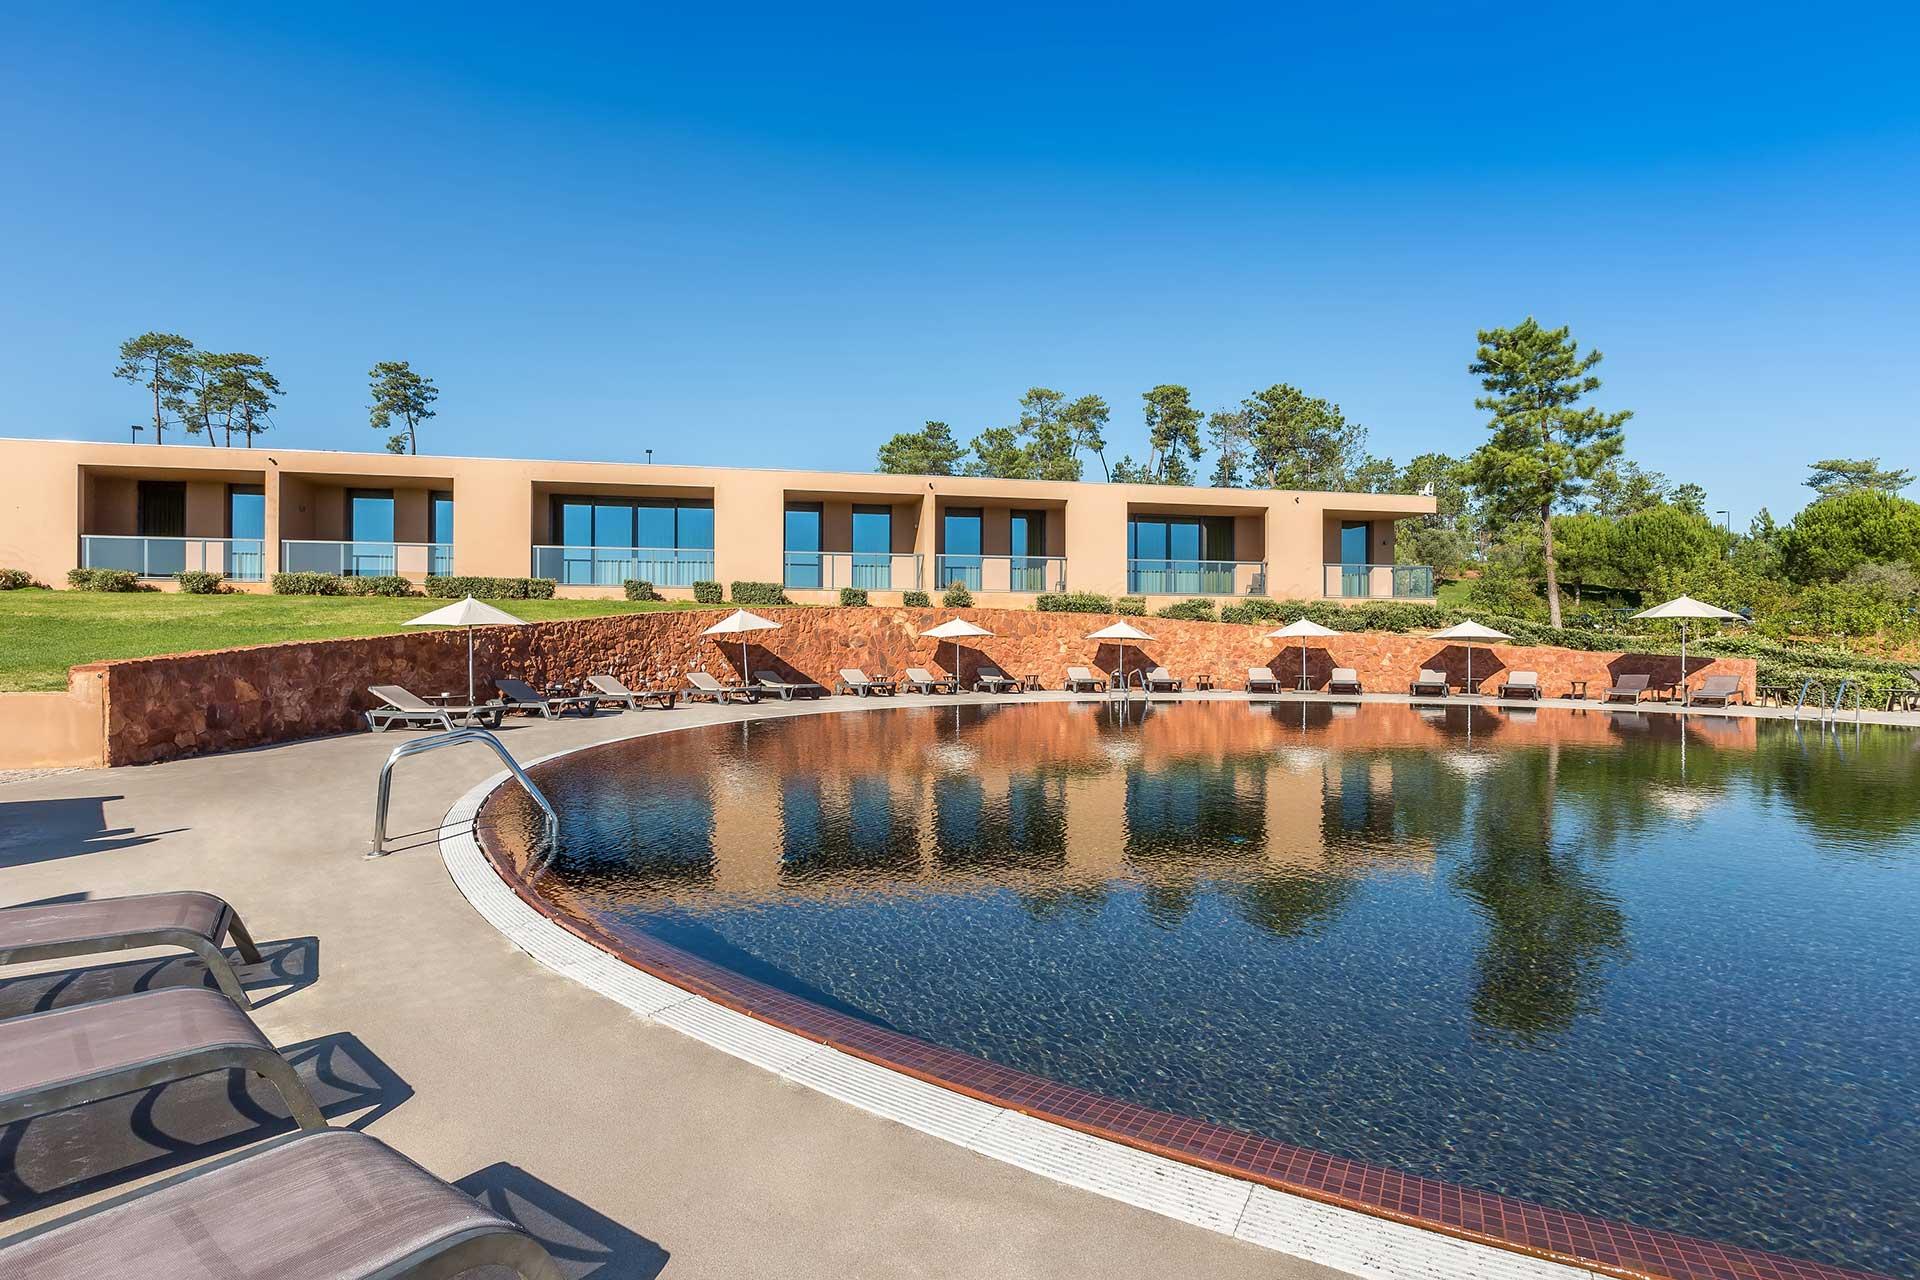 Golf-expedition-golfreizen-golfresort-Morgado-Golf-&-Country-Club-pool